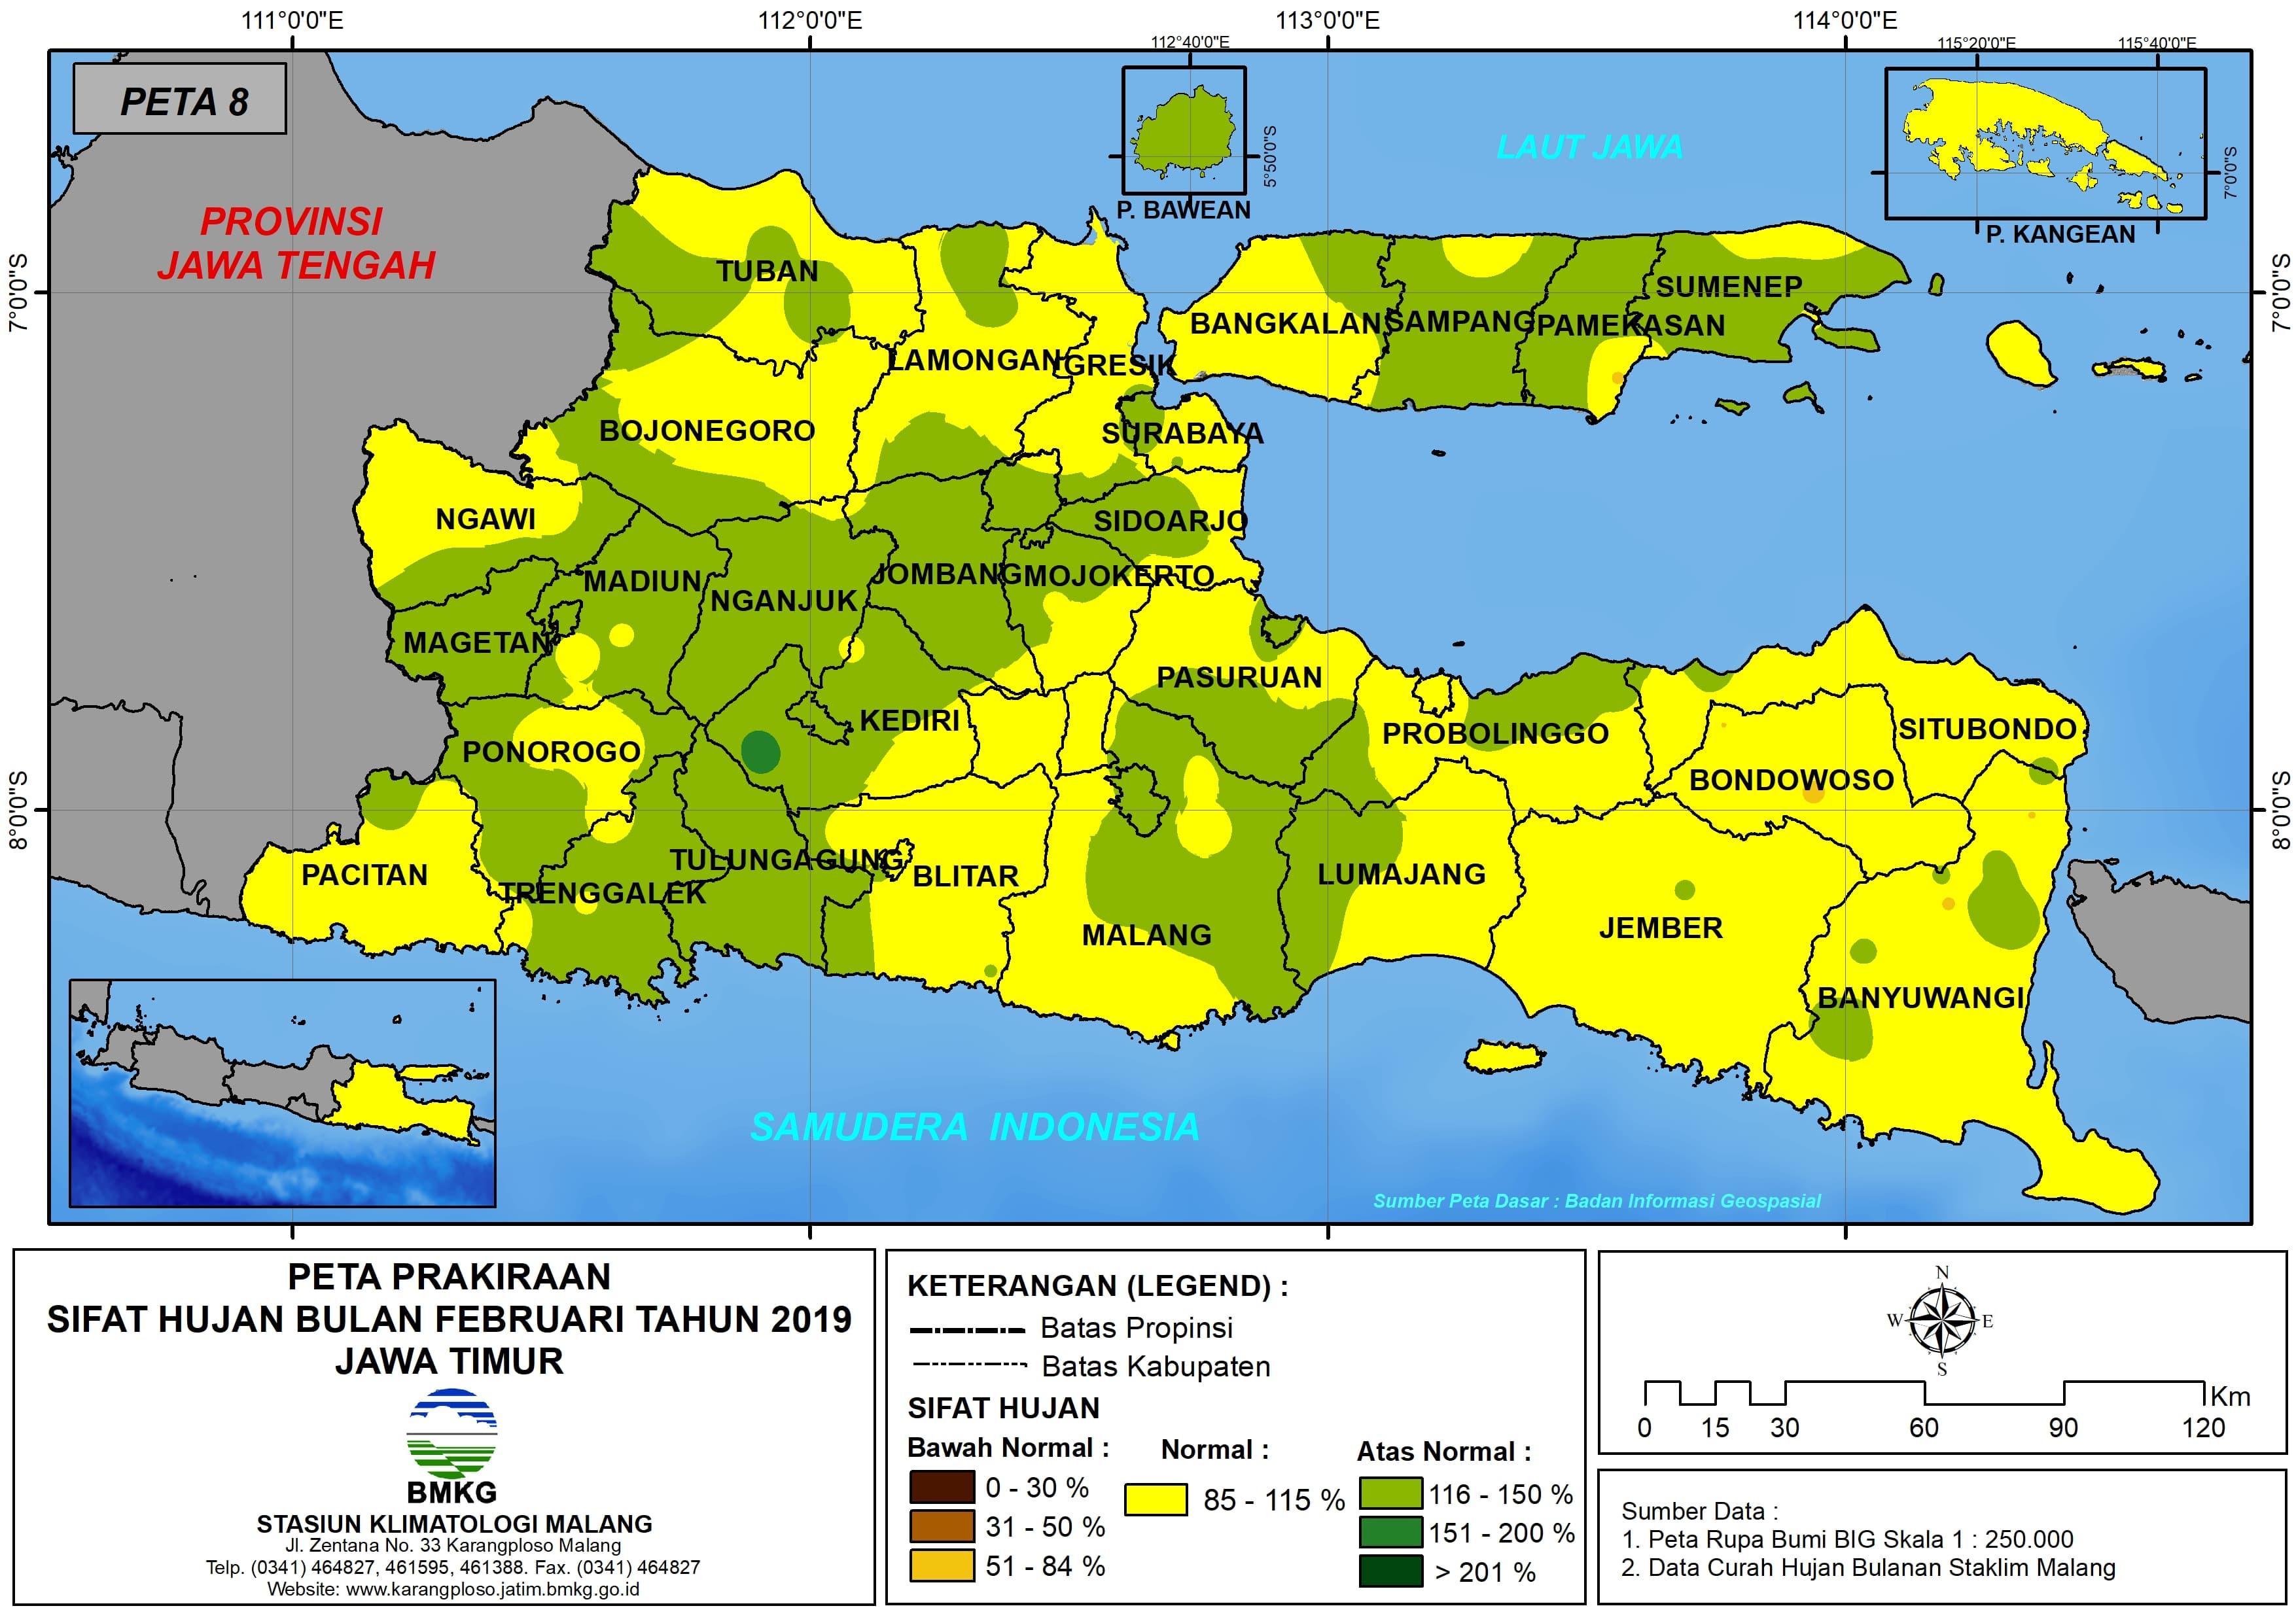 Prakiraan Sifat Hujan Bulan Februari Tahun 2018 di Provinsi Jawa Timur Update dari Analisis Bulan Oktober 2018